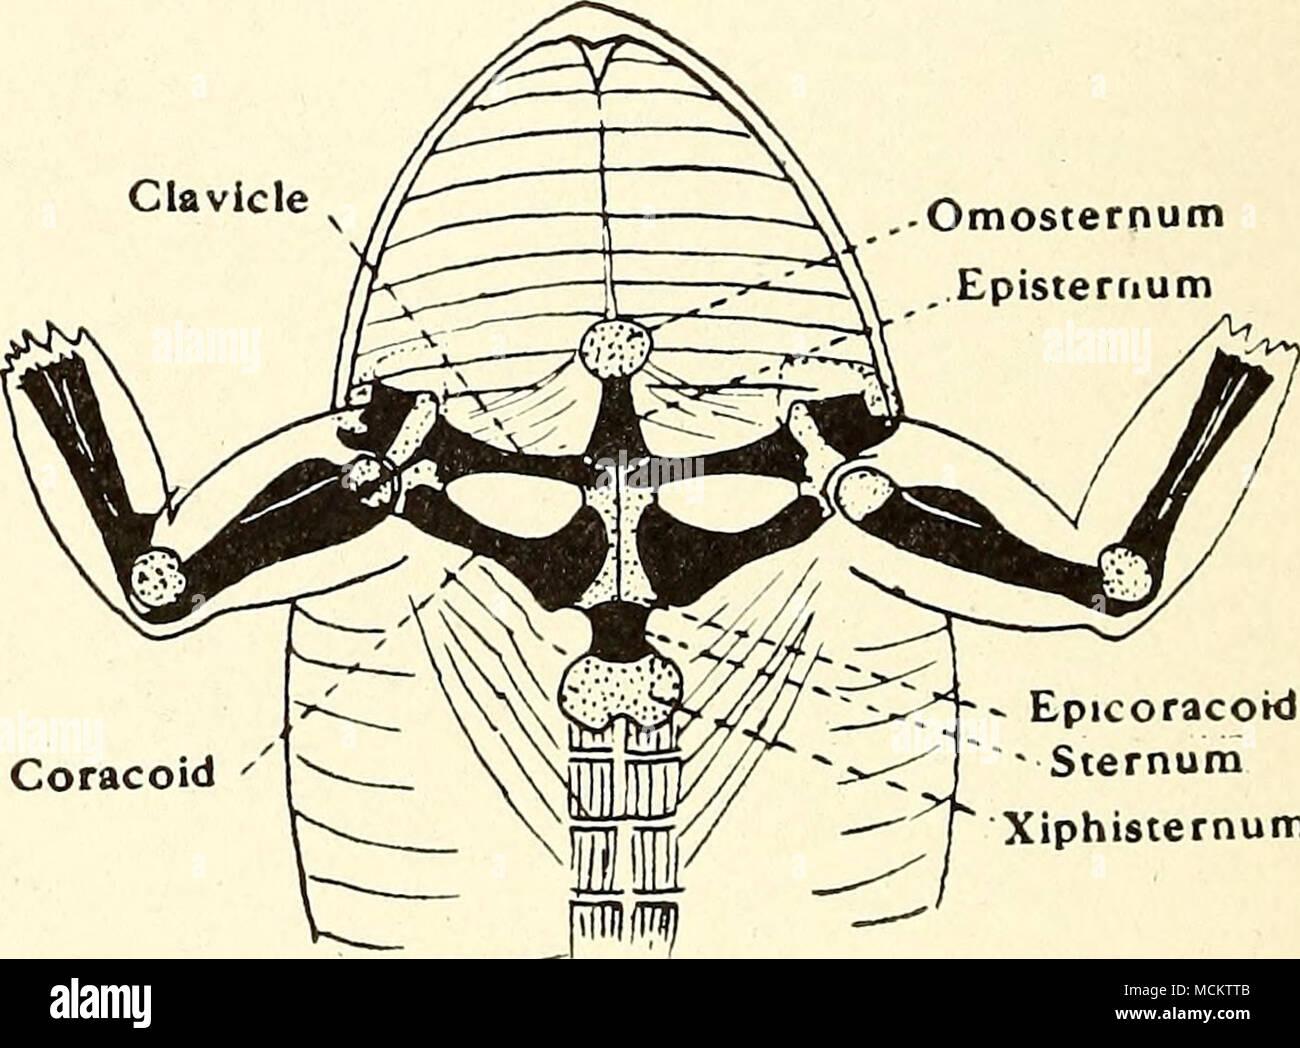 Coracoid Epicoracoid Sternum Xiphisternum Fig 4pectoral Girdle Of